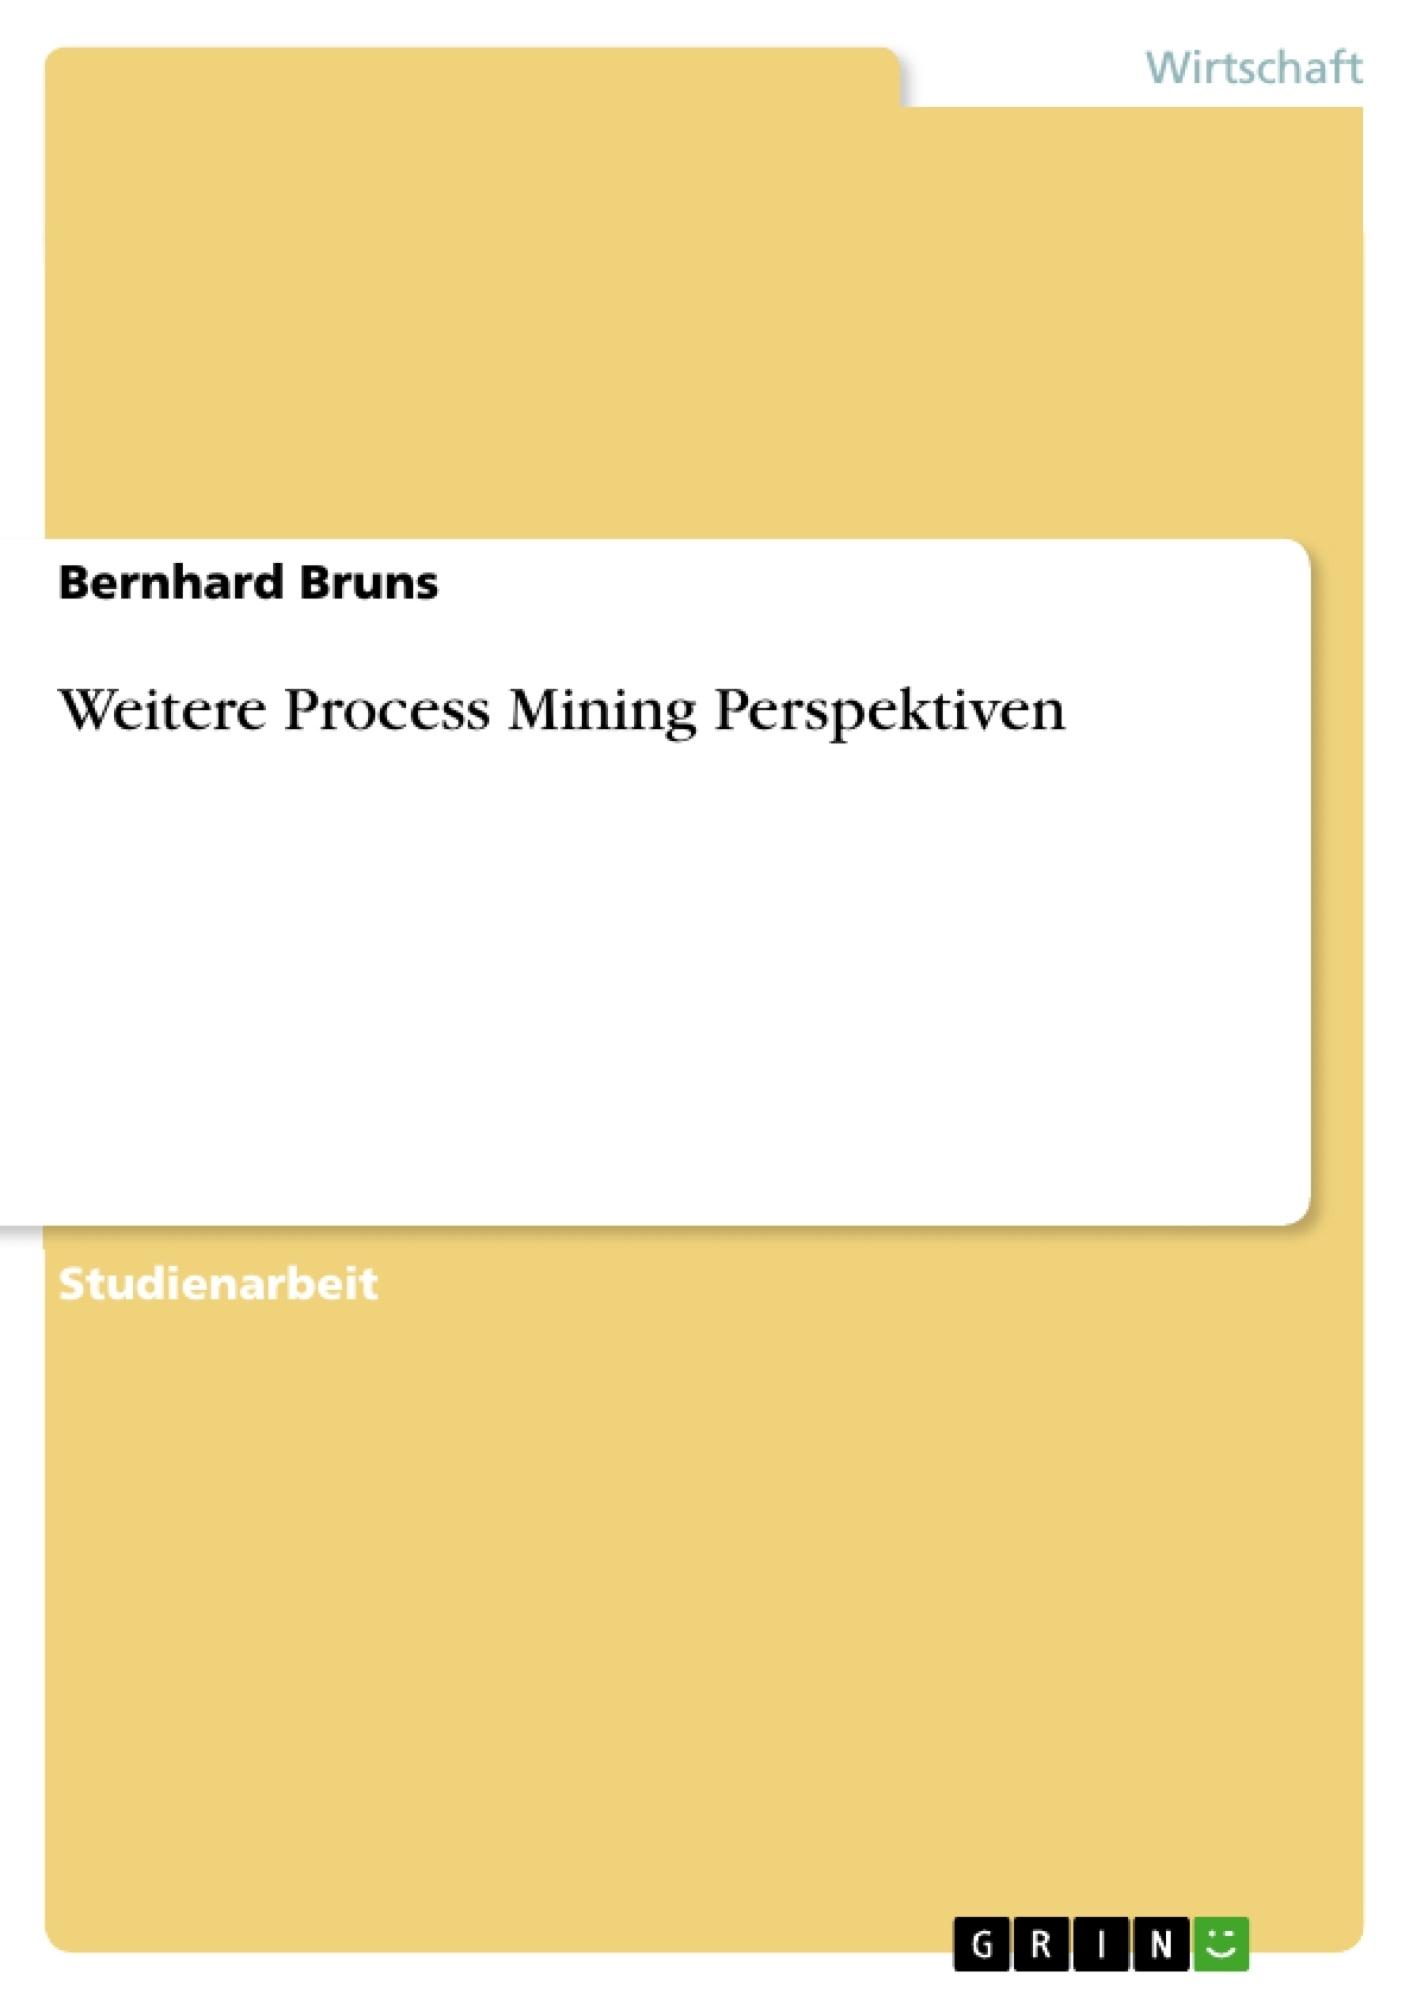 Titel: Weitere Process Mining Perspektiven